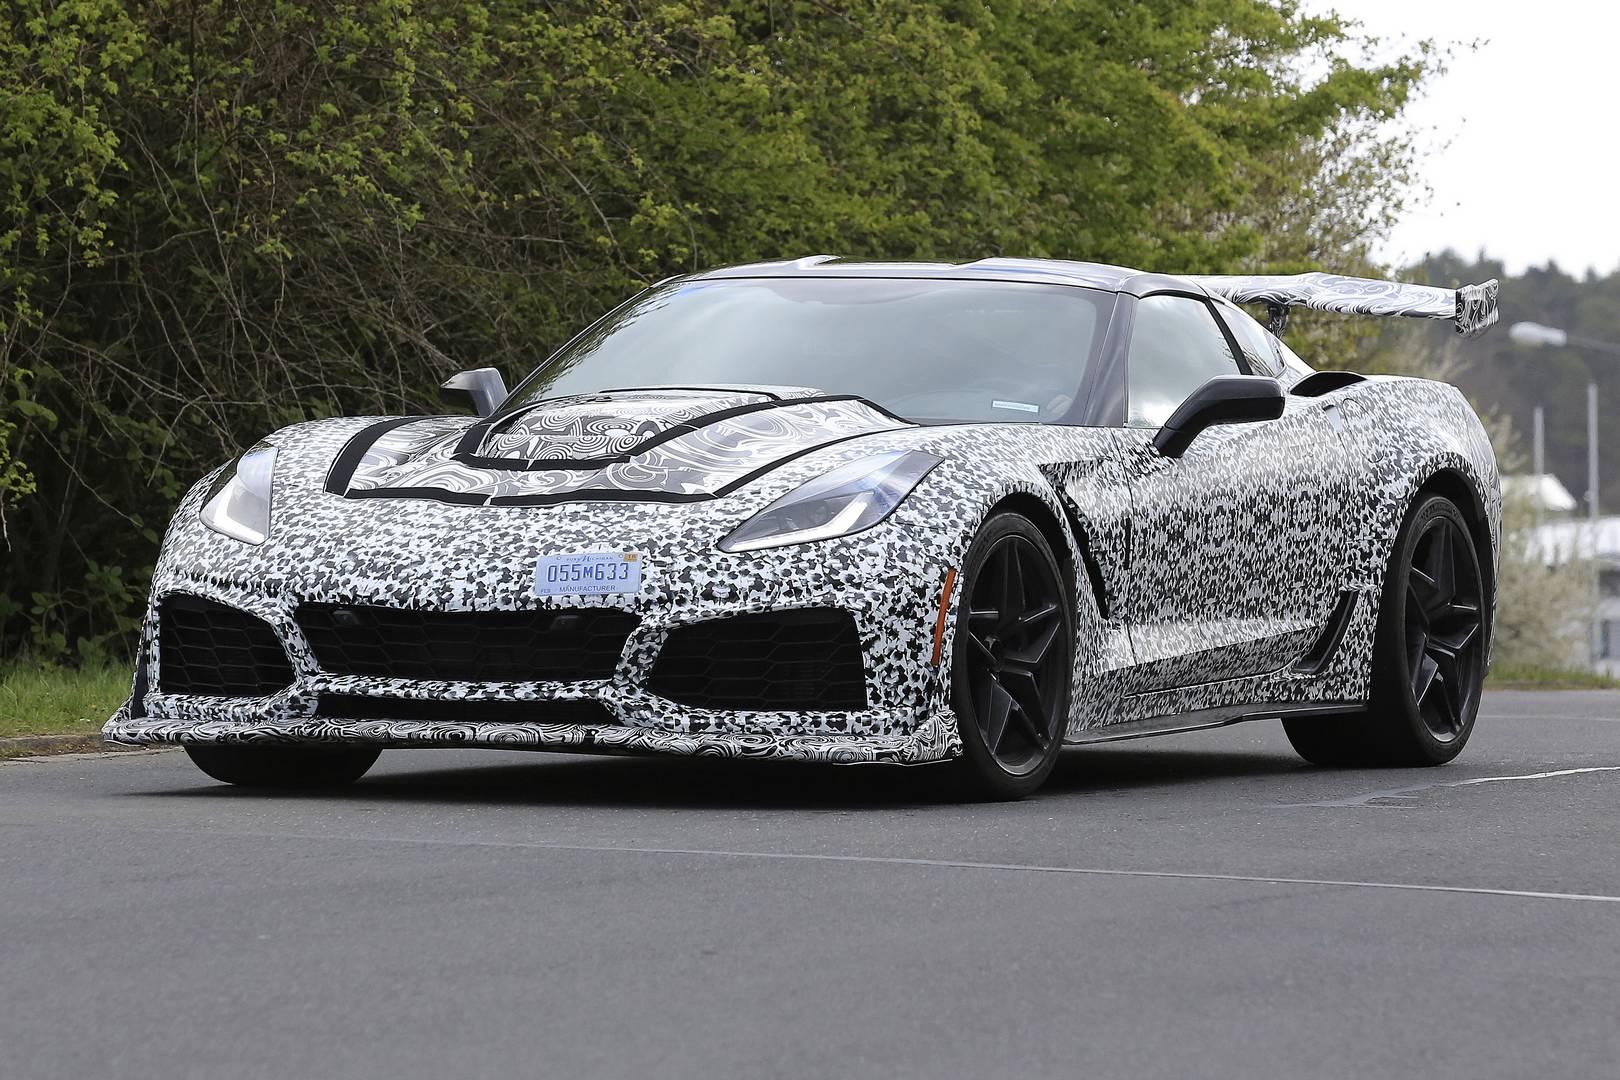 2018 Corvette ZR1 Newest Spy Shots - GTspirit